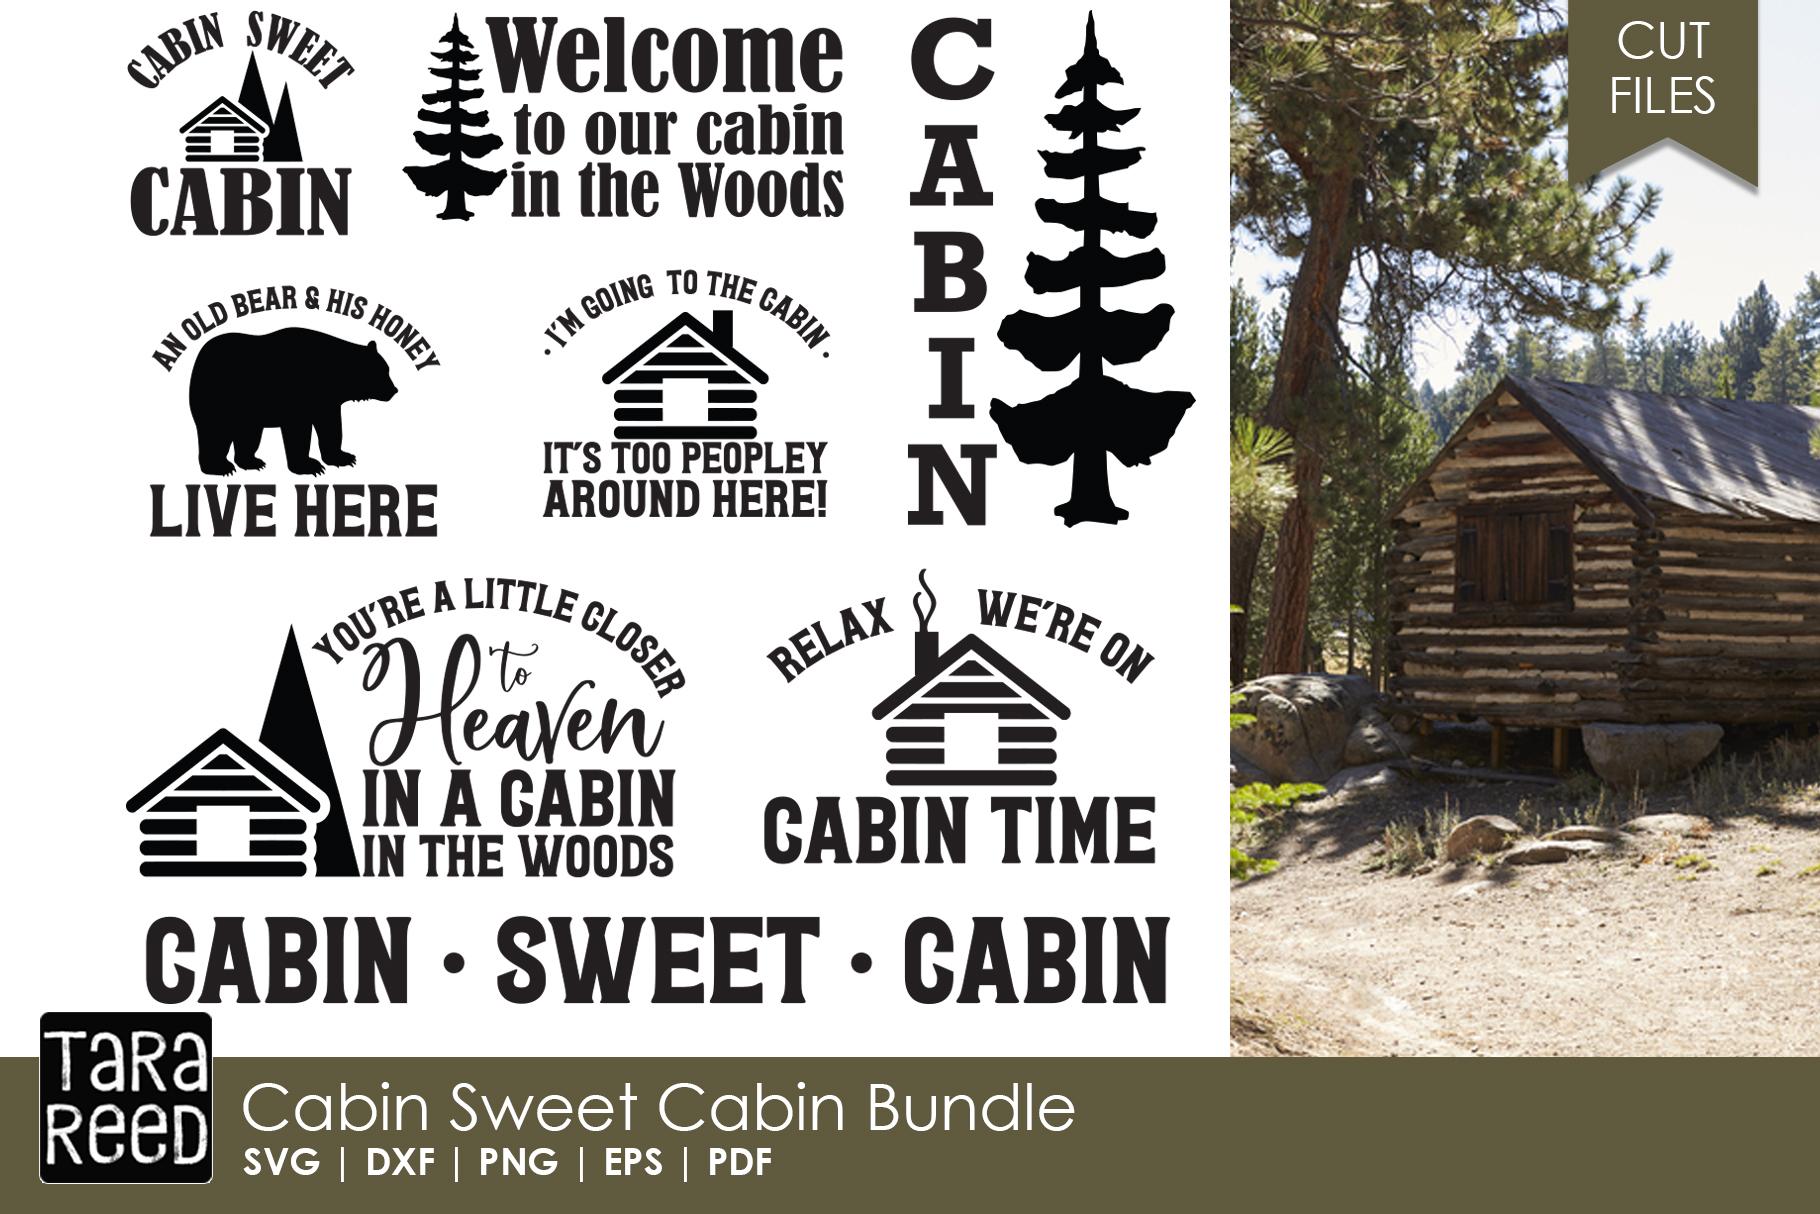 Cabin Sweet Cabin Bundle example image 1